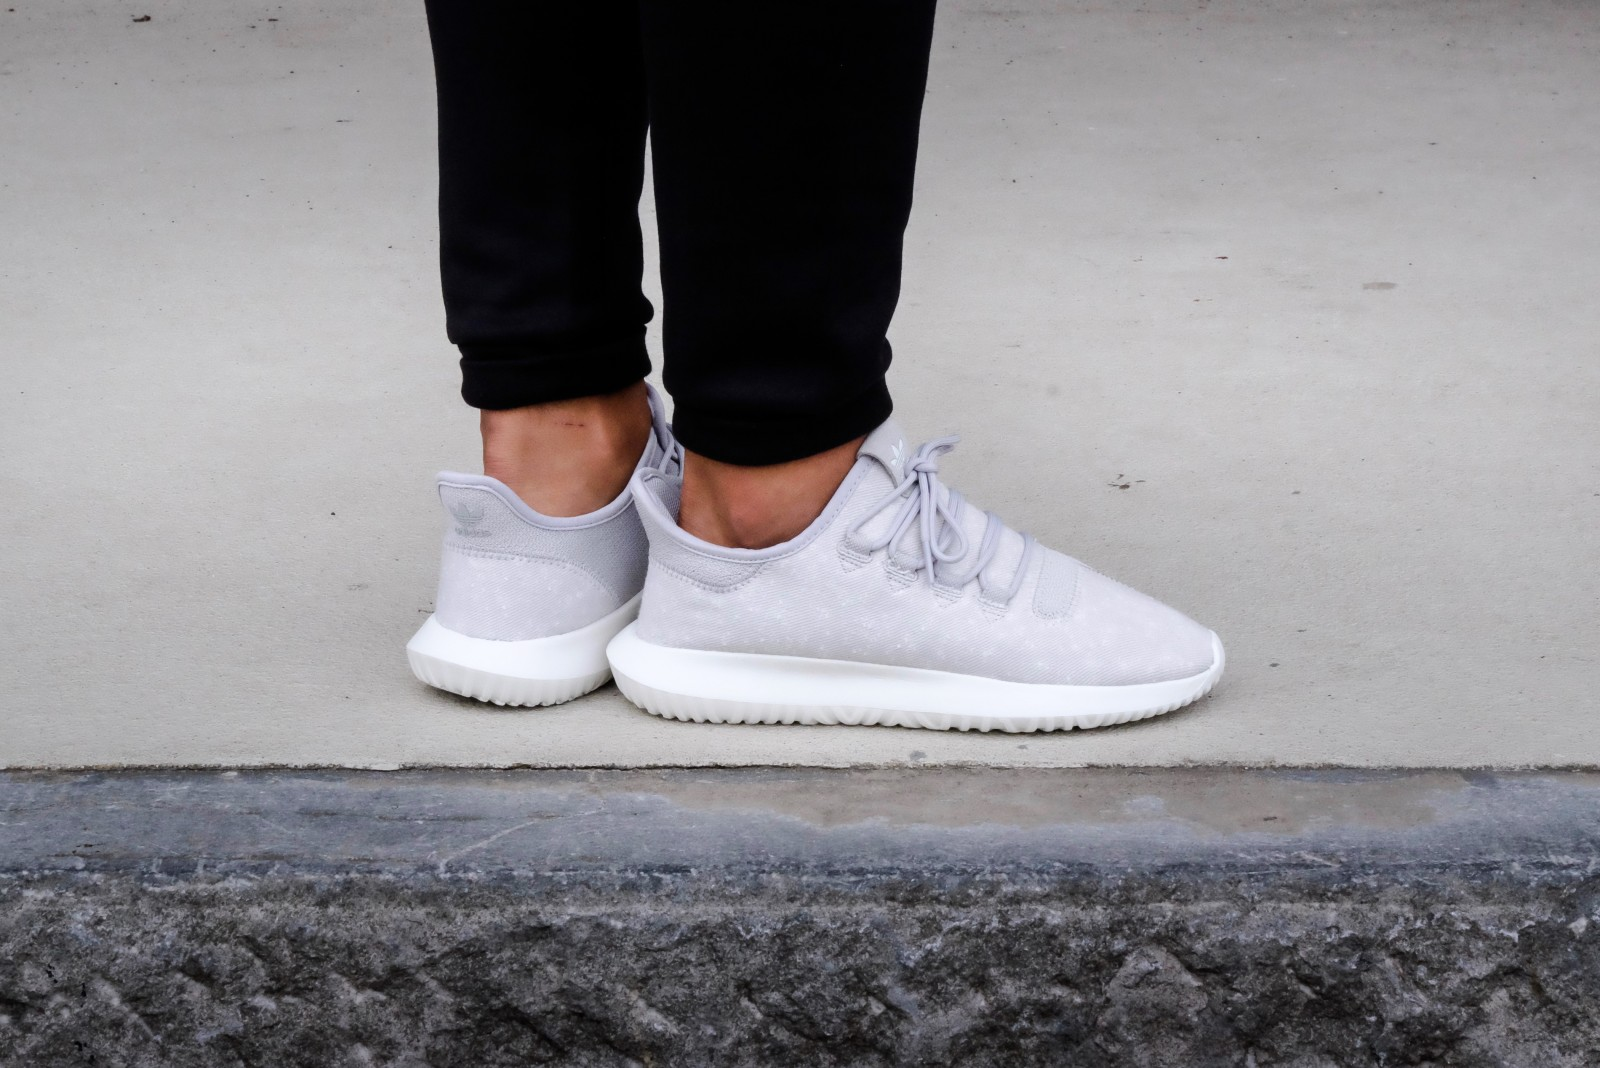 Adidas Tubular Shadow Grey Two Cristal White By3570